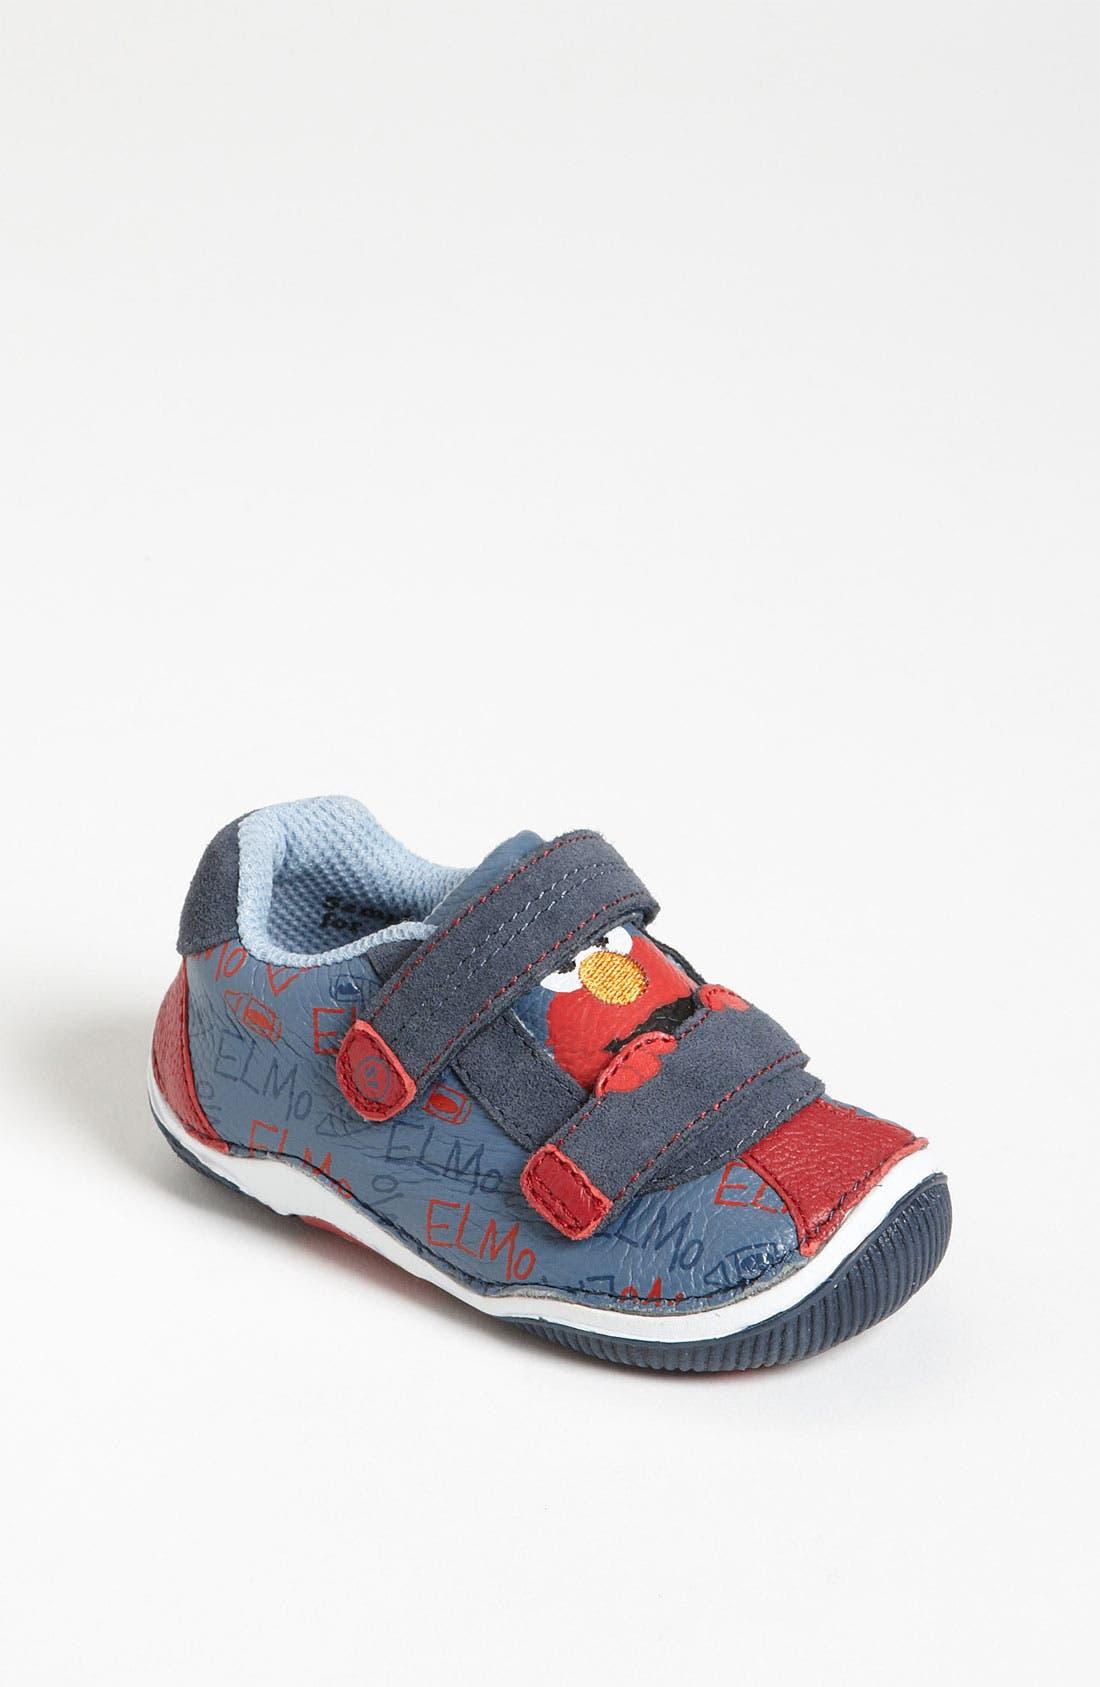 Main Image - Stride Rite 'Elmo' Sneaker (Baby, Walker & Toddler)